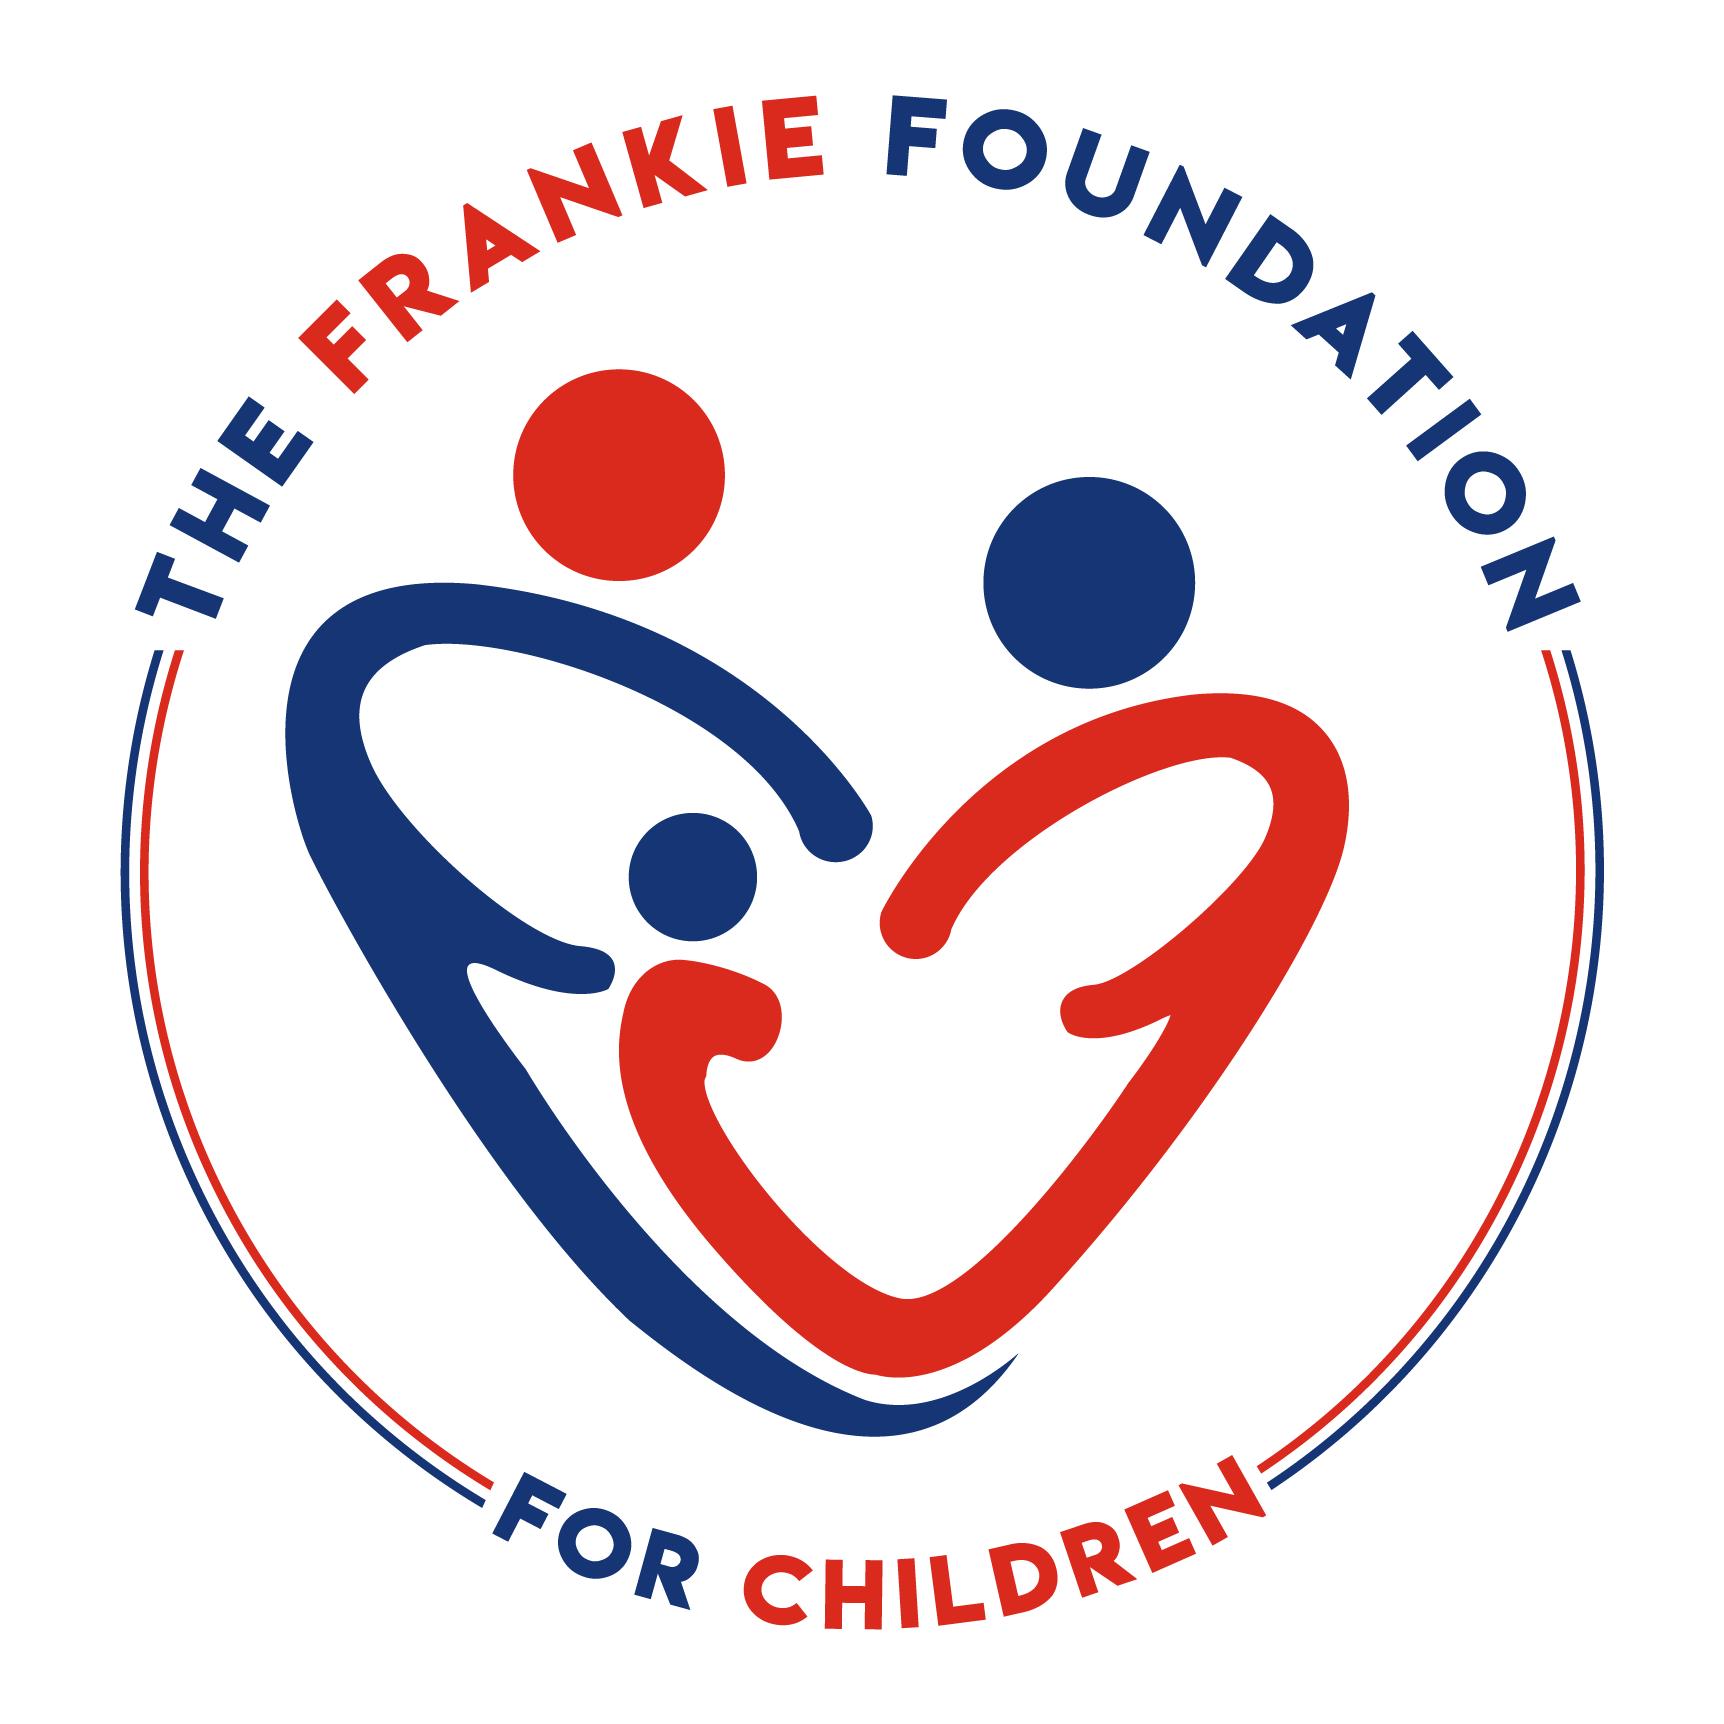 The Frankie Foundation for Children